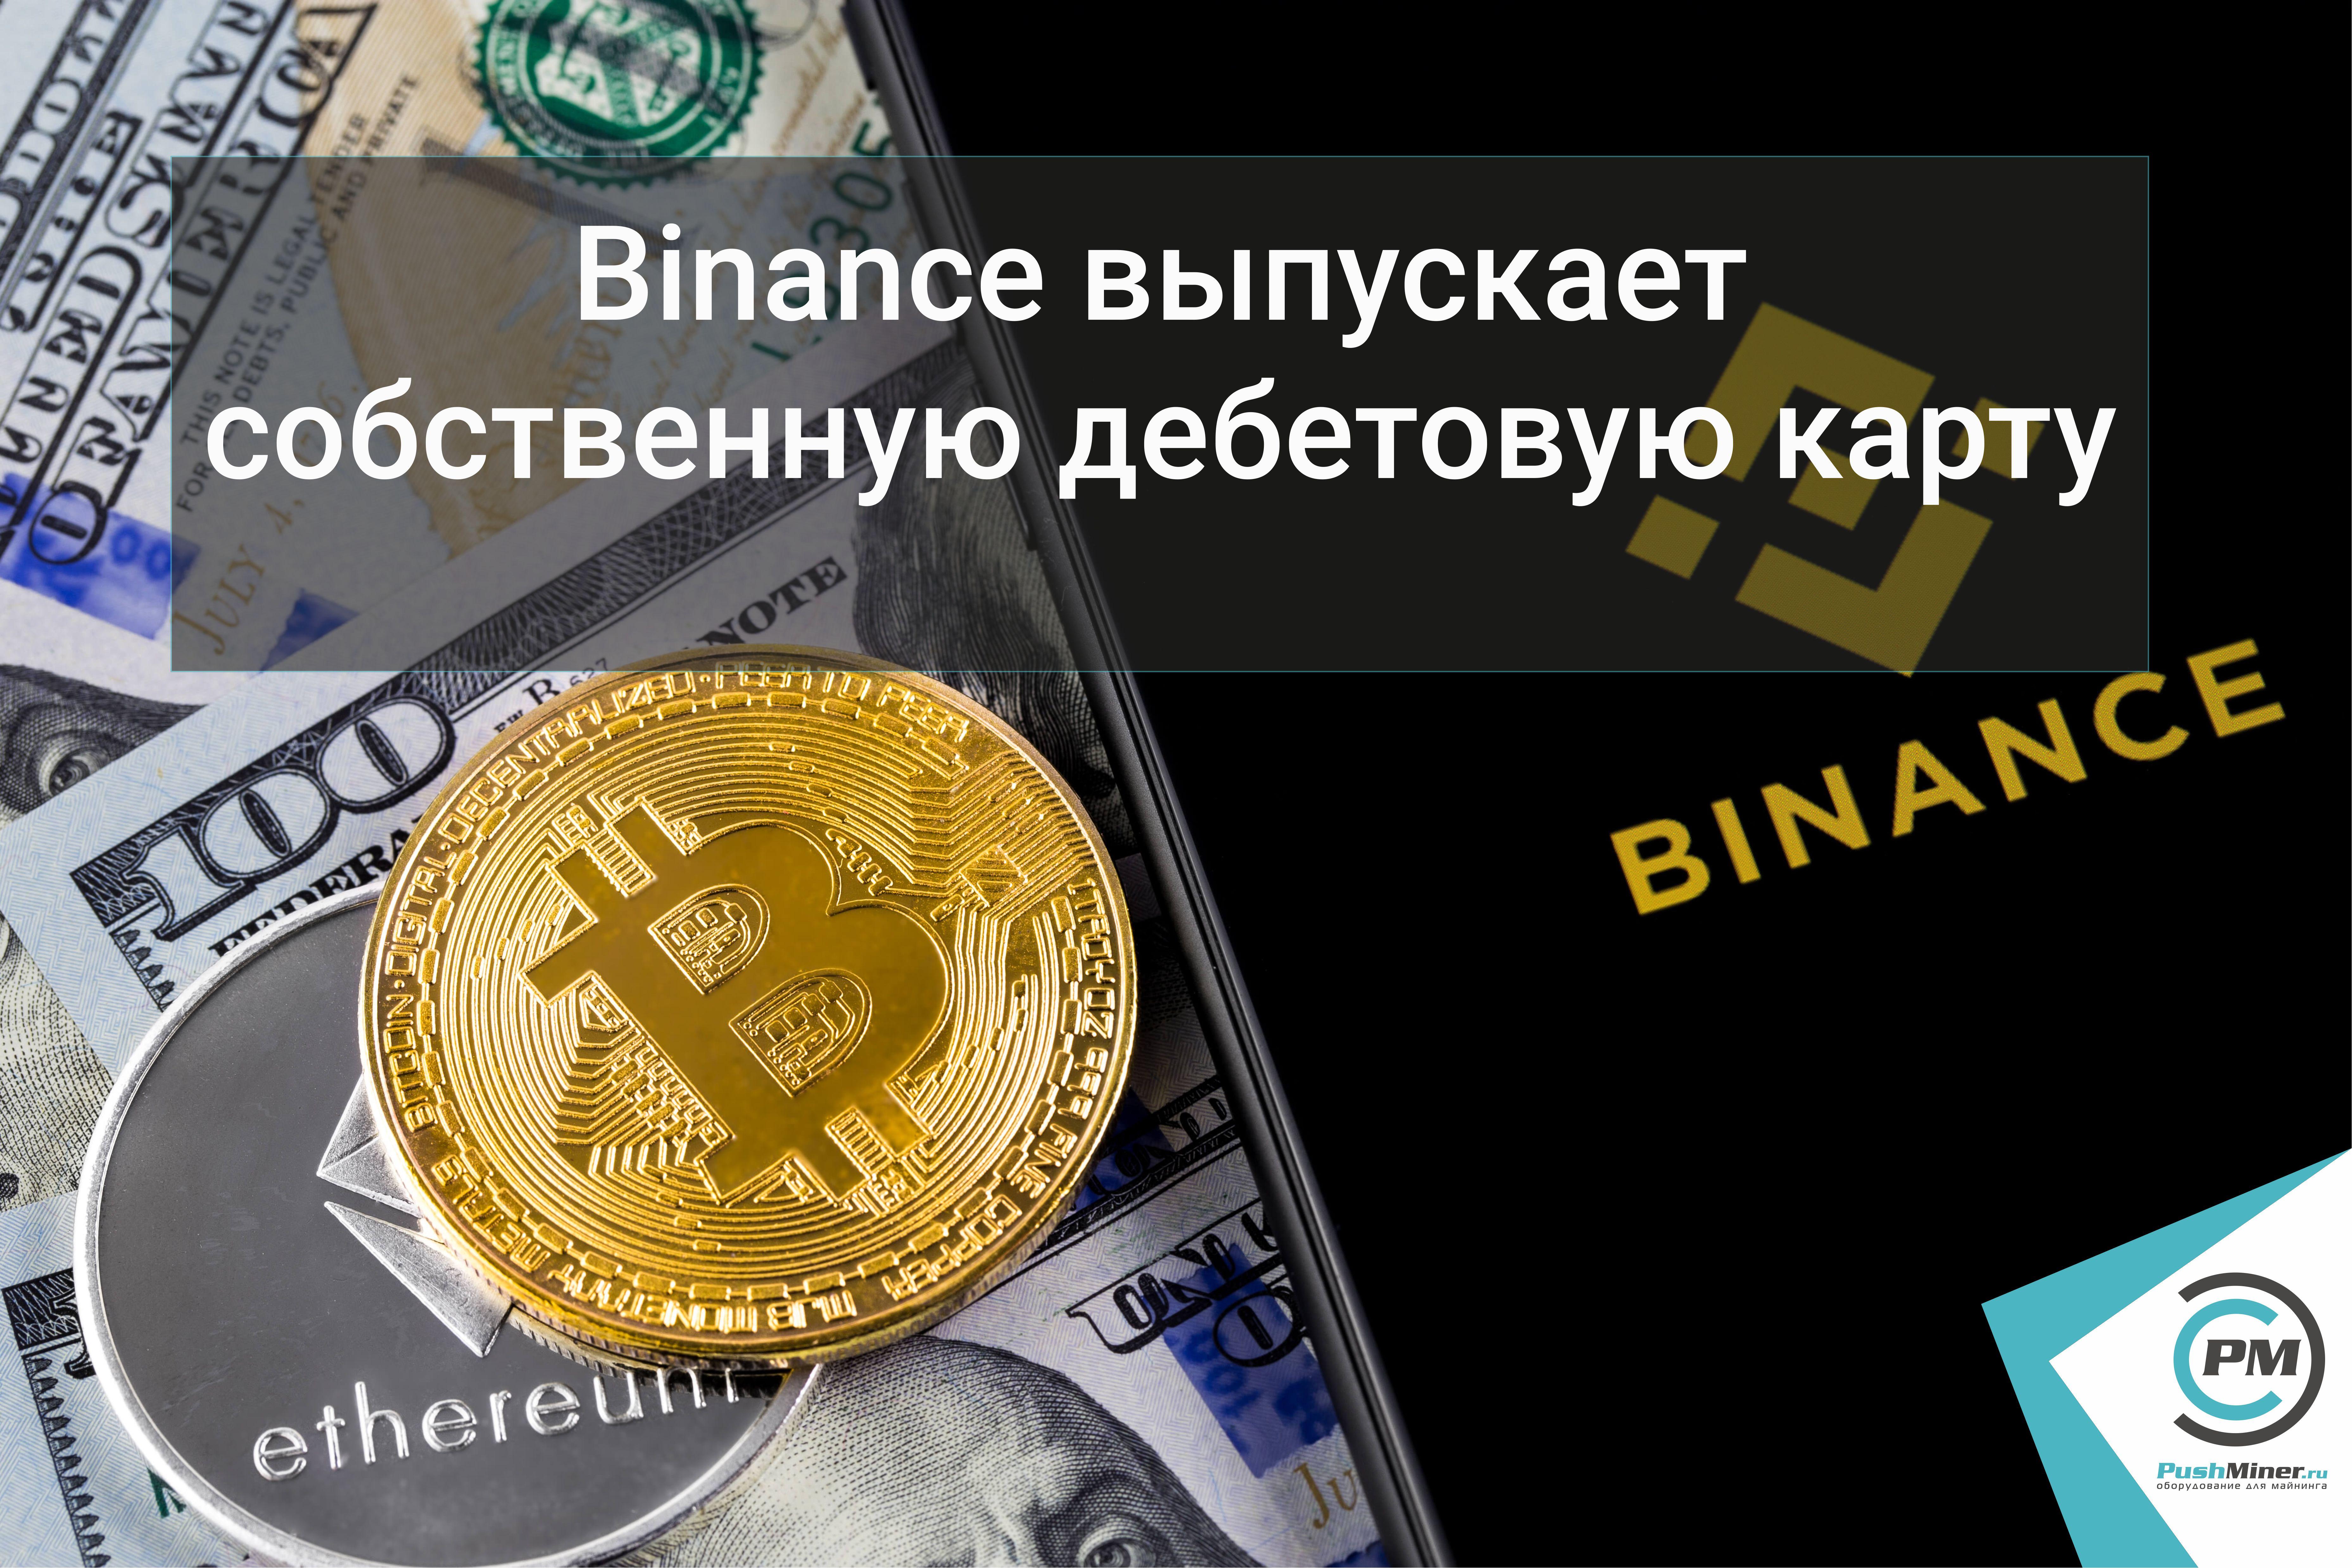 Binance выпускает собственную дебетовую карту